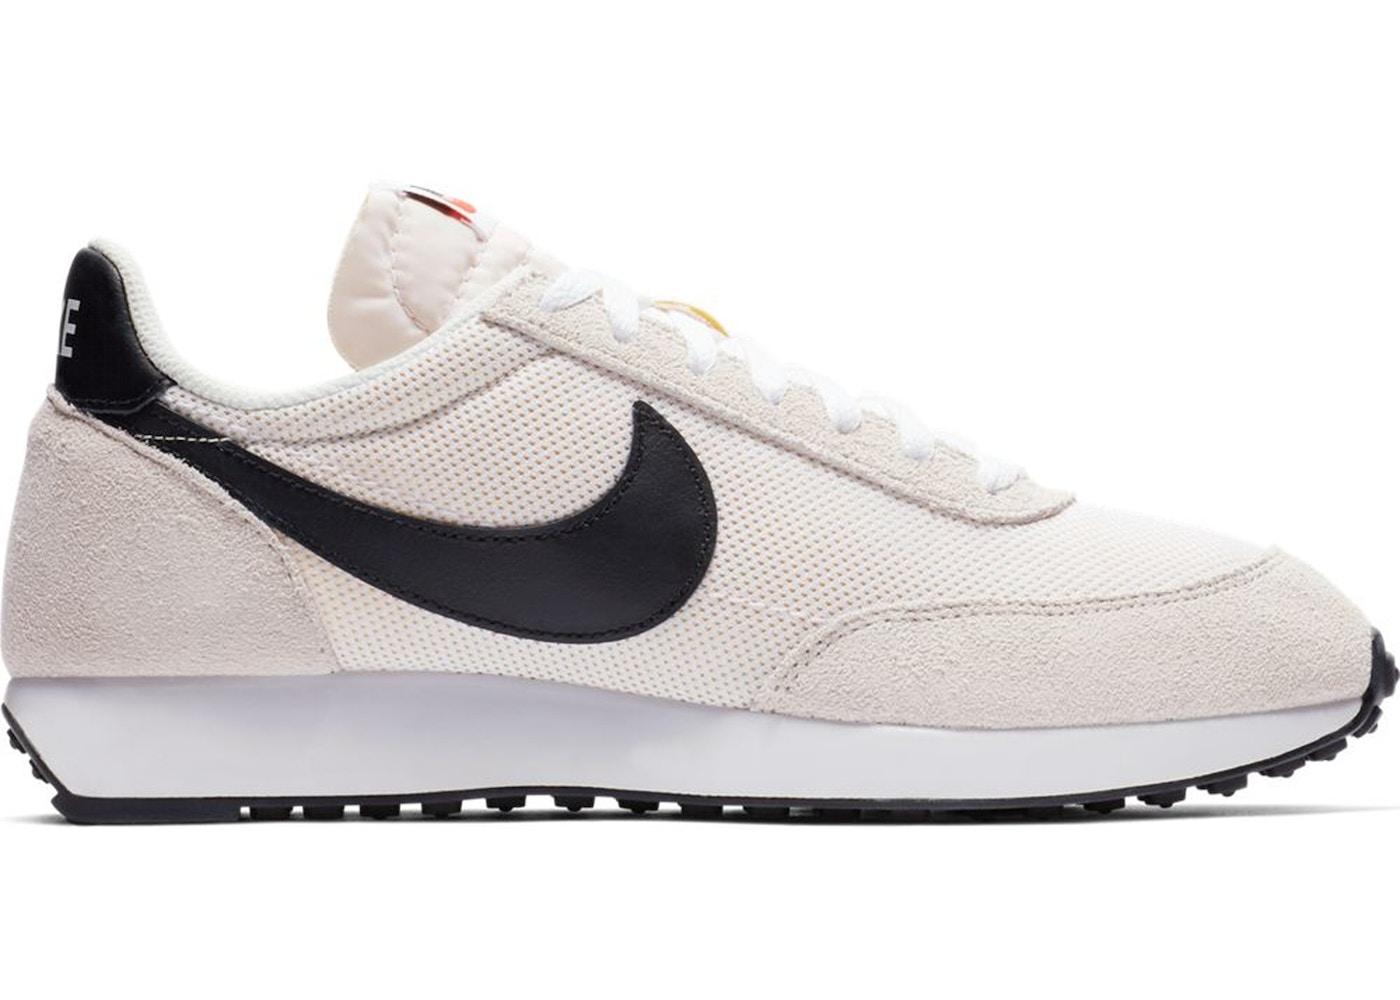 Nike Air Tailwind 79 White Phantom Black